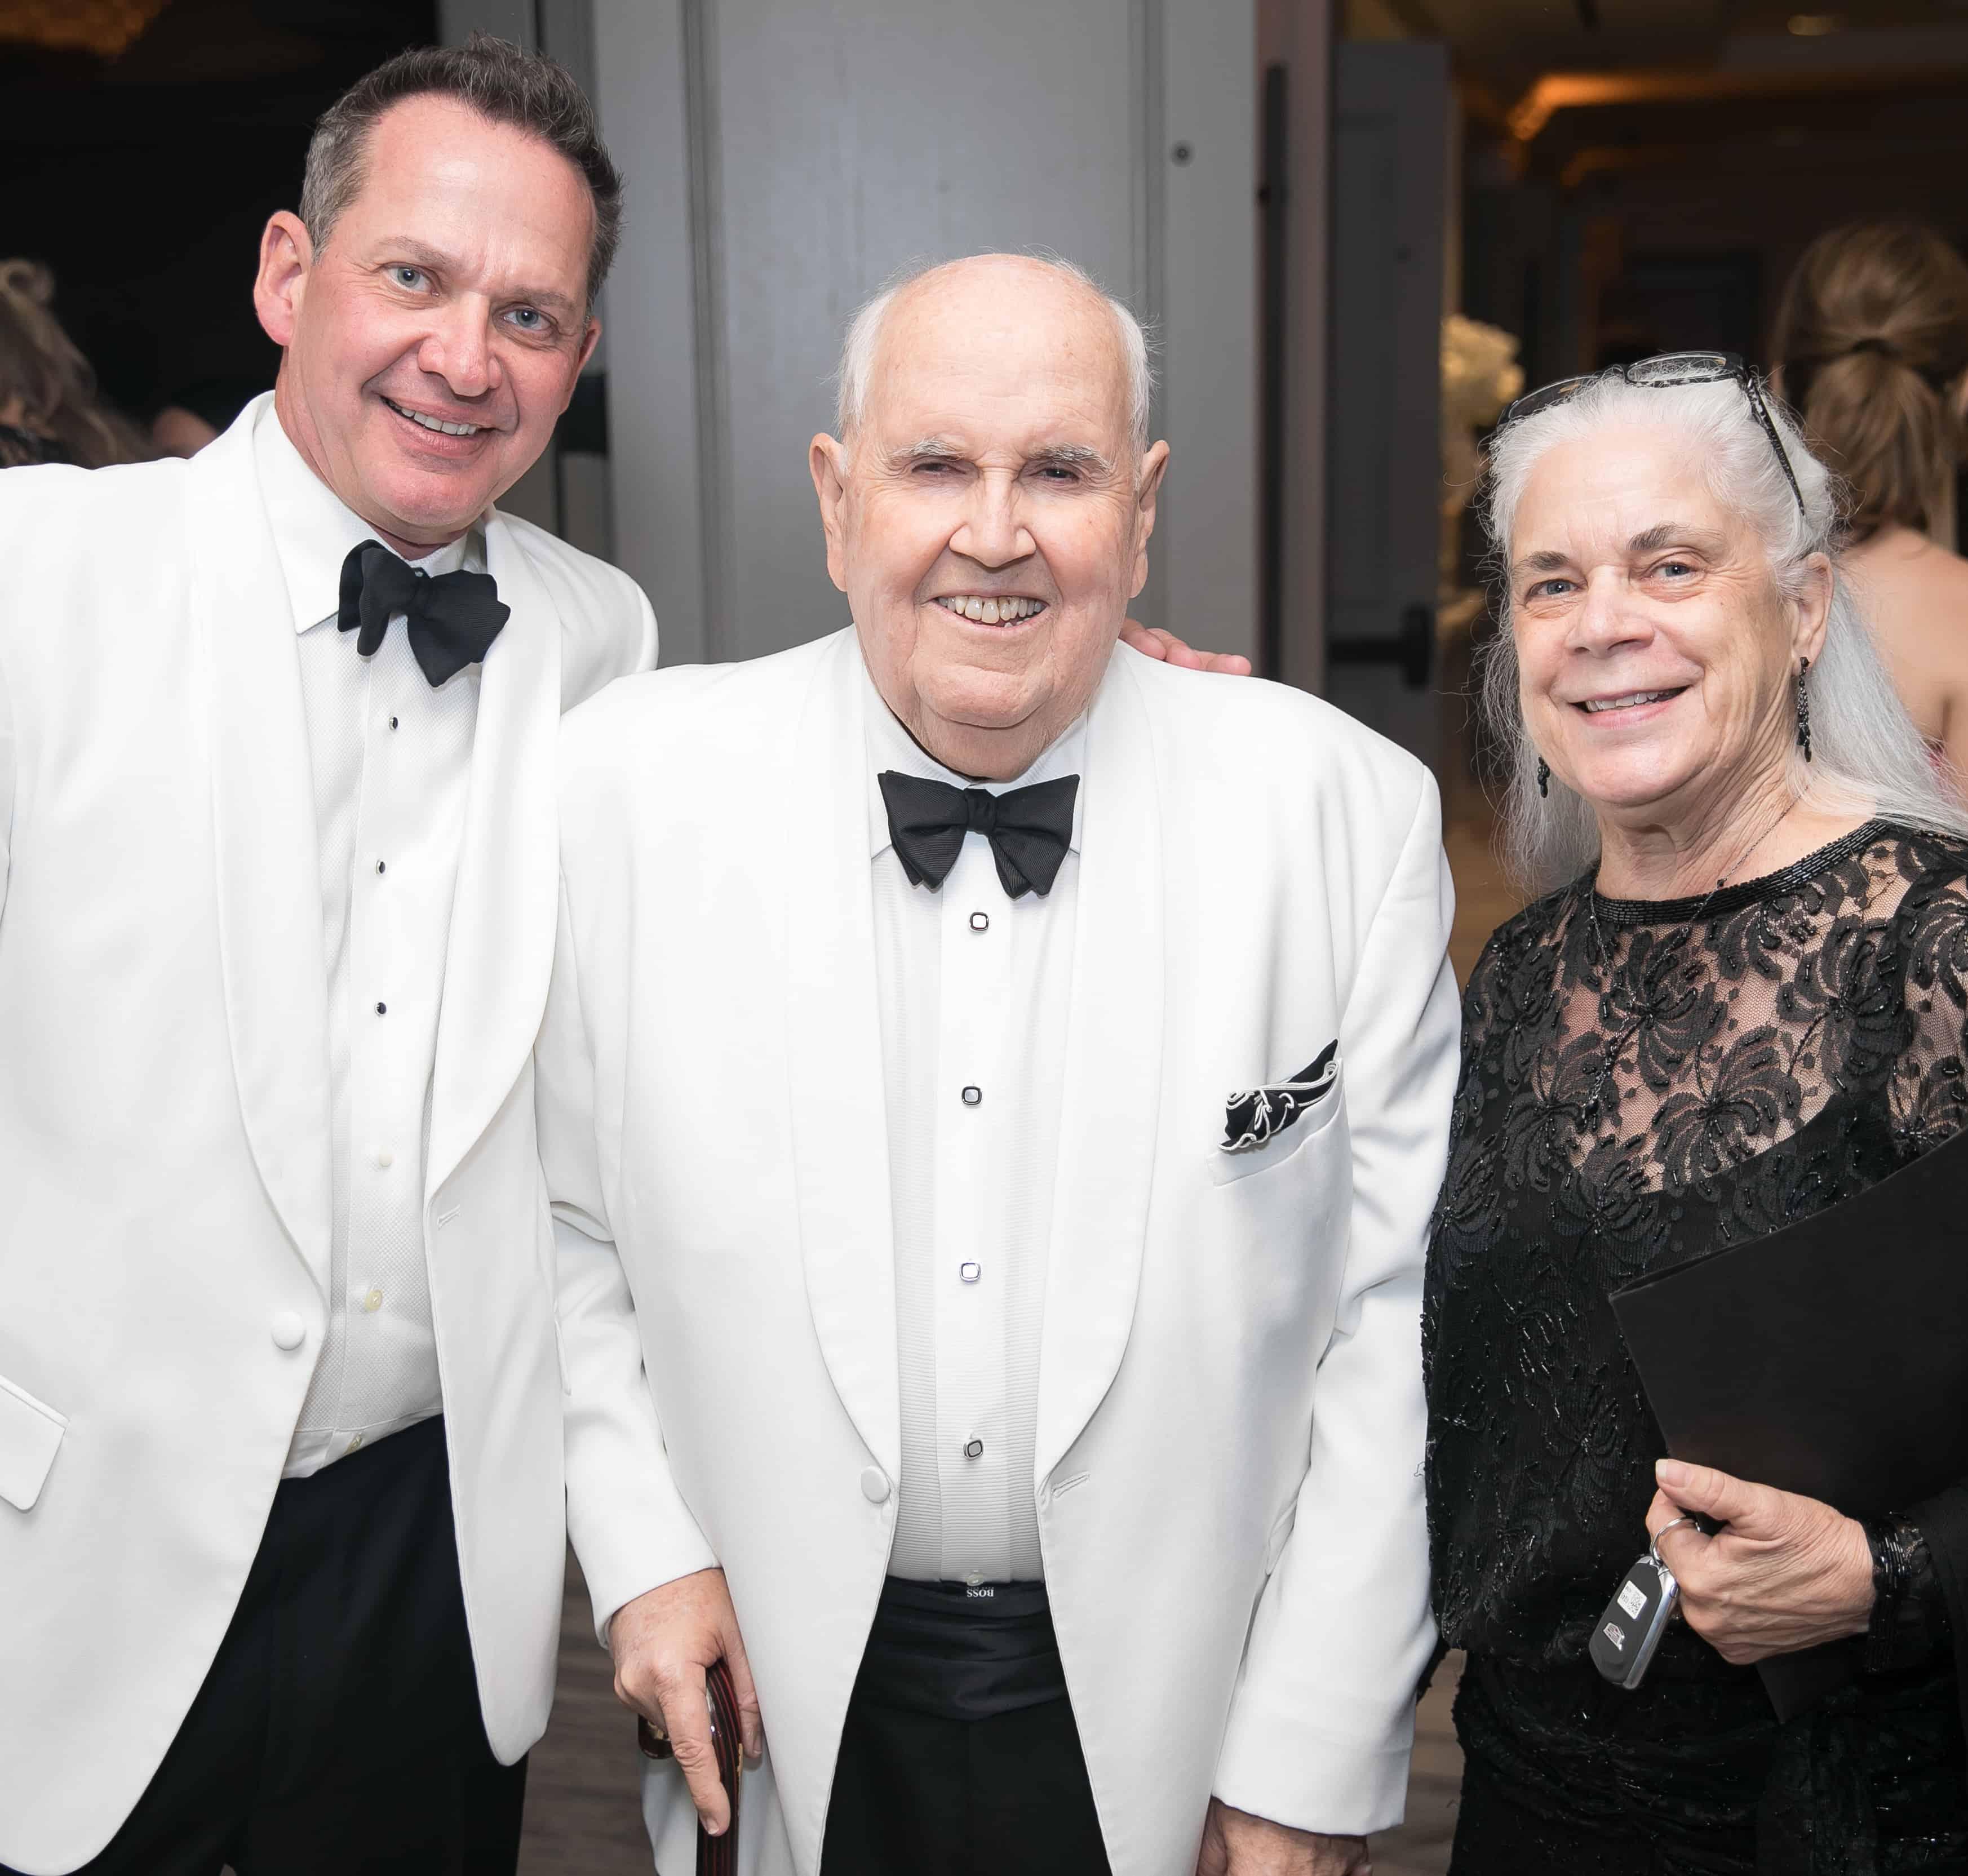 Dr. Bill Kessler, Bill Little and Kim Scoffield